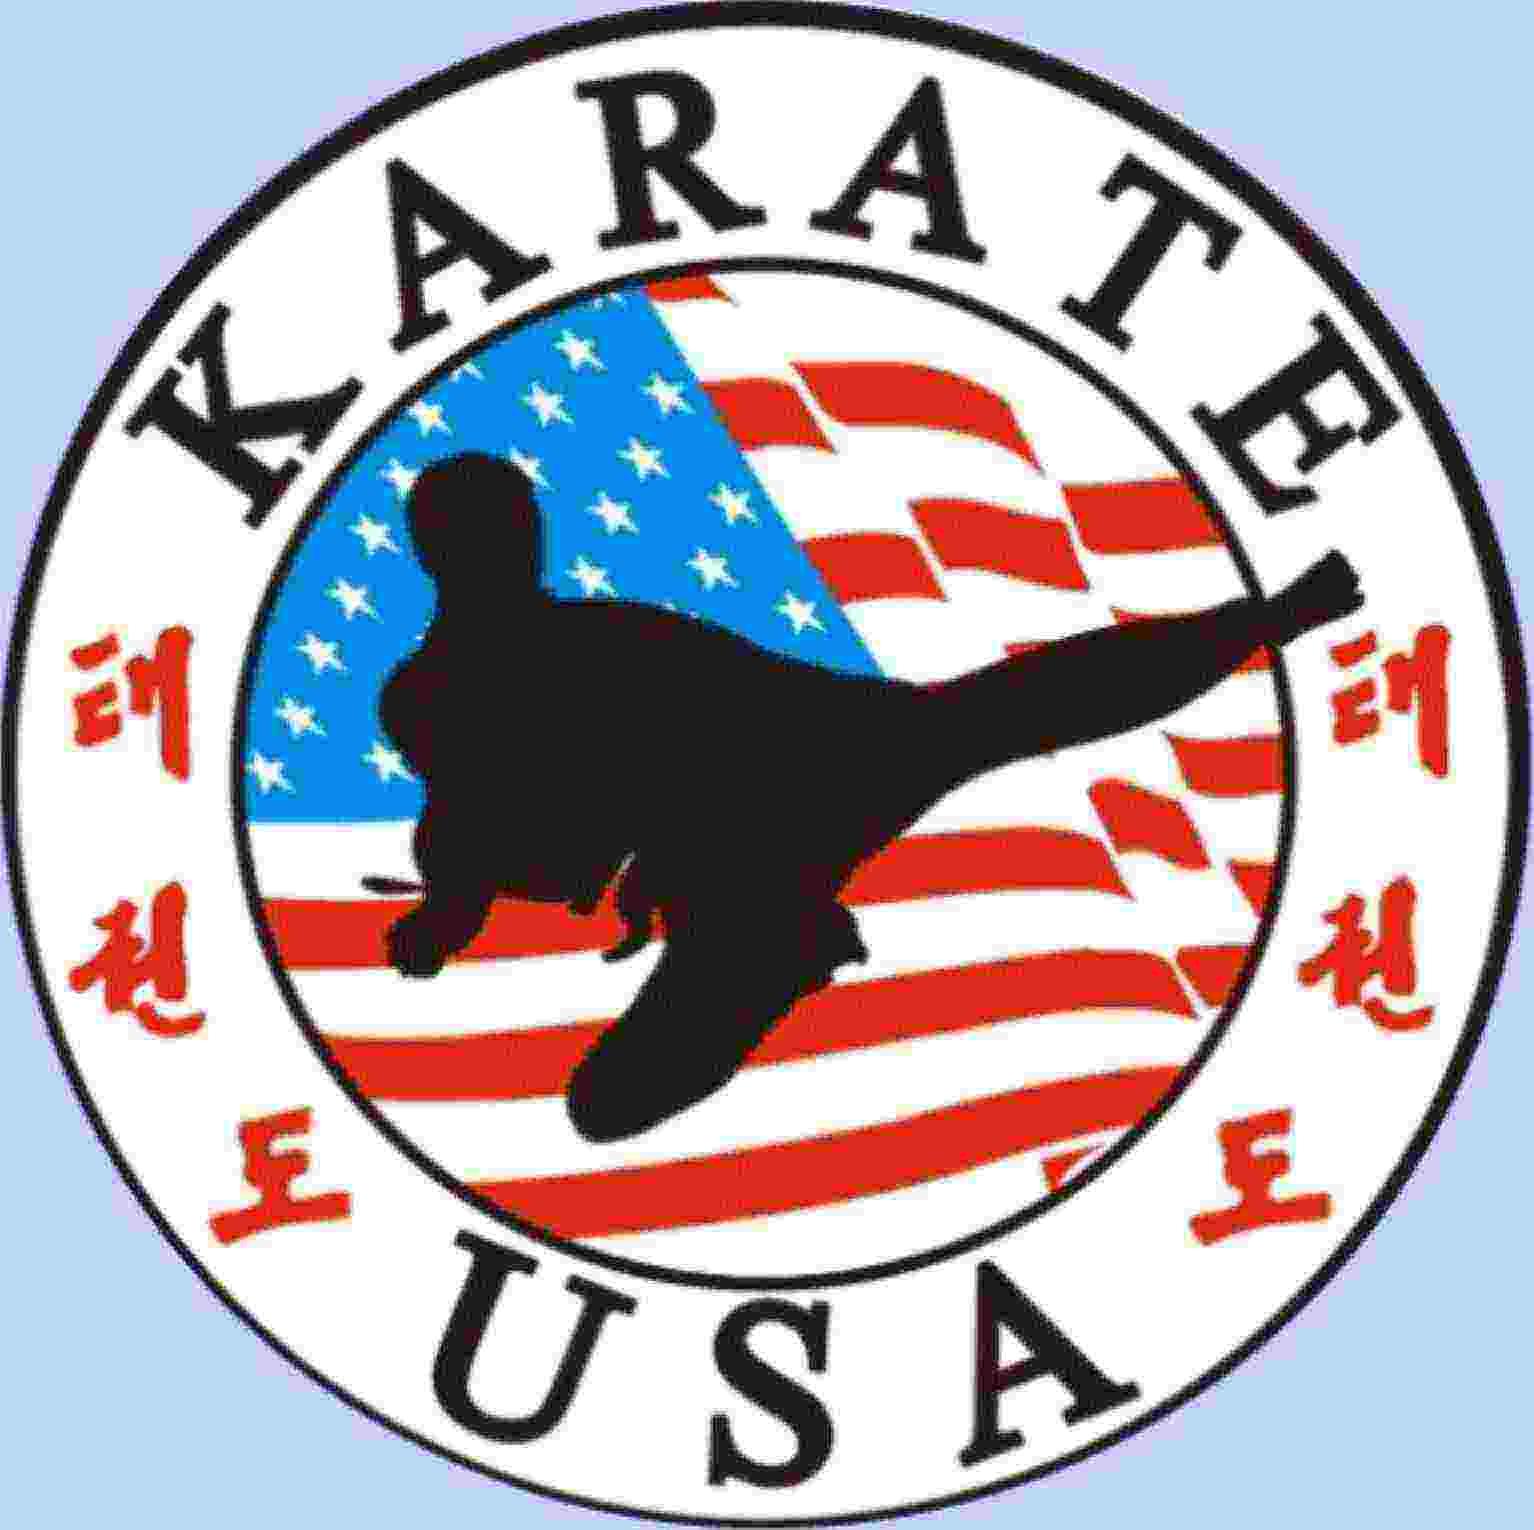 Karate Logo - ClipArt Best